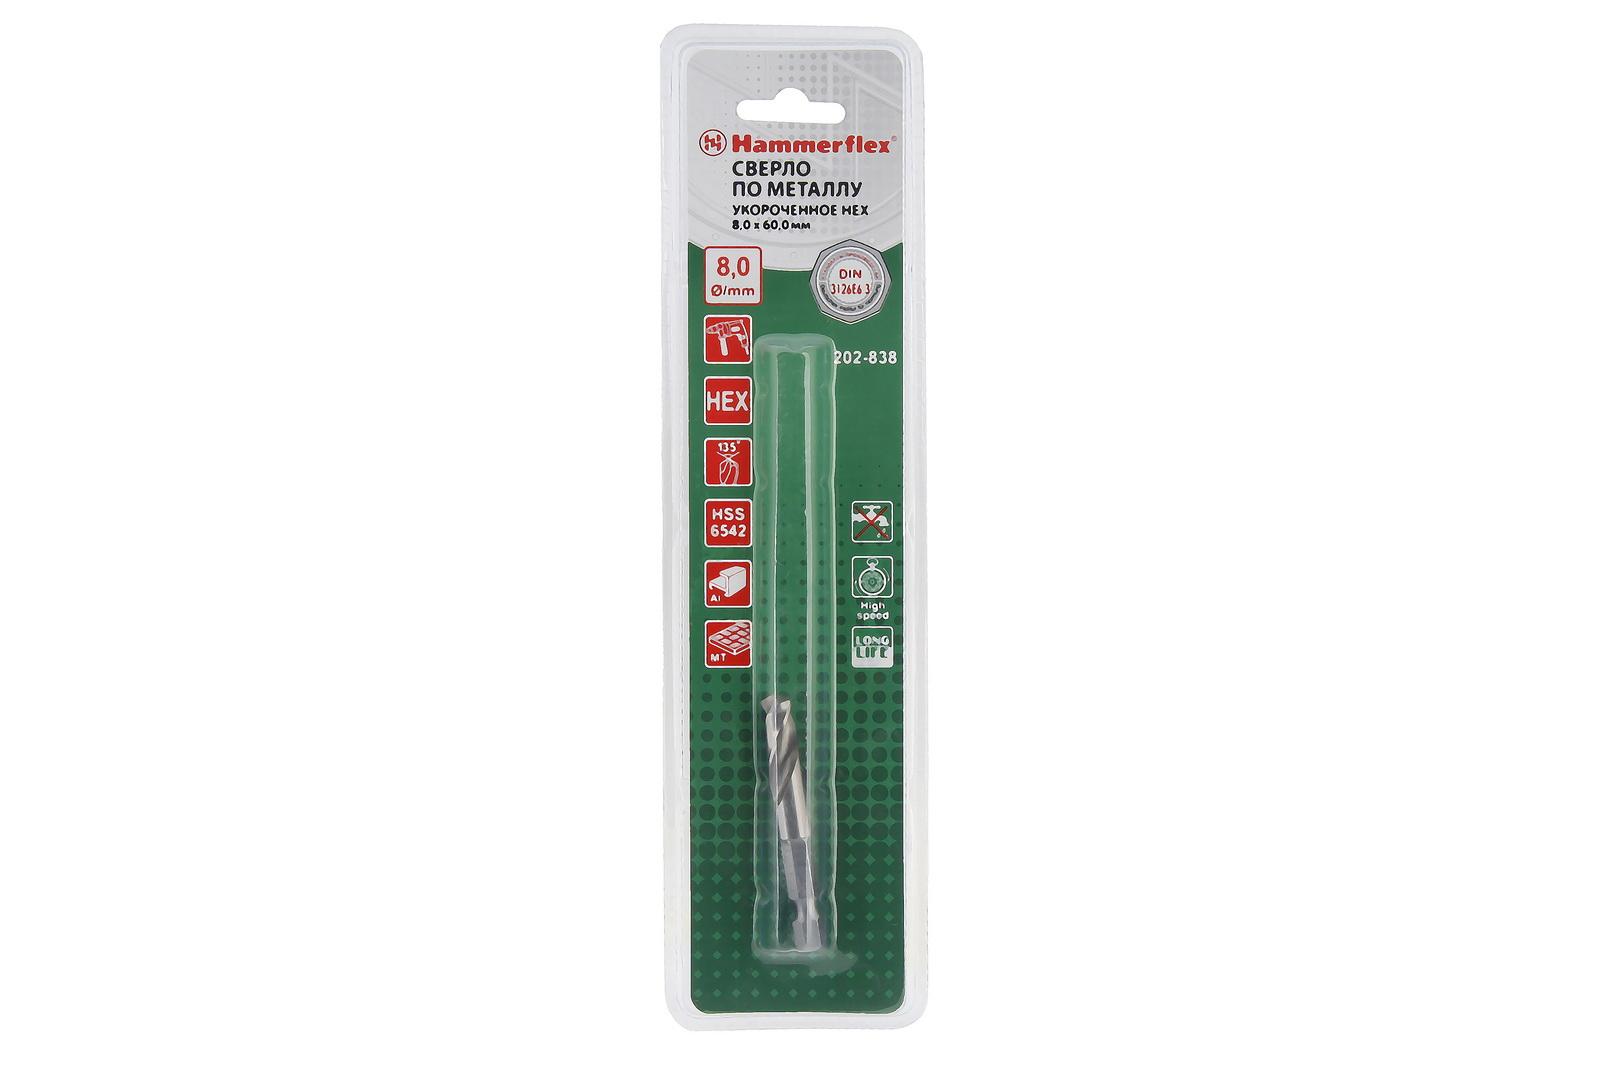 Сверло по металлу Hammer 202-838 dr mt stub 8,0мм*60мм набор сверл hammer flex 202 918 dr по металлу 15шт [62933]